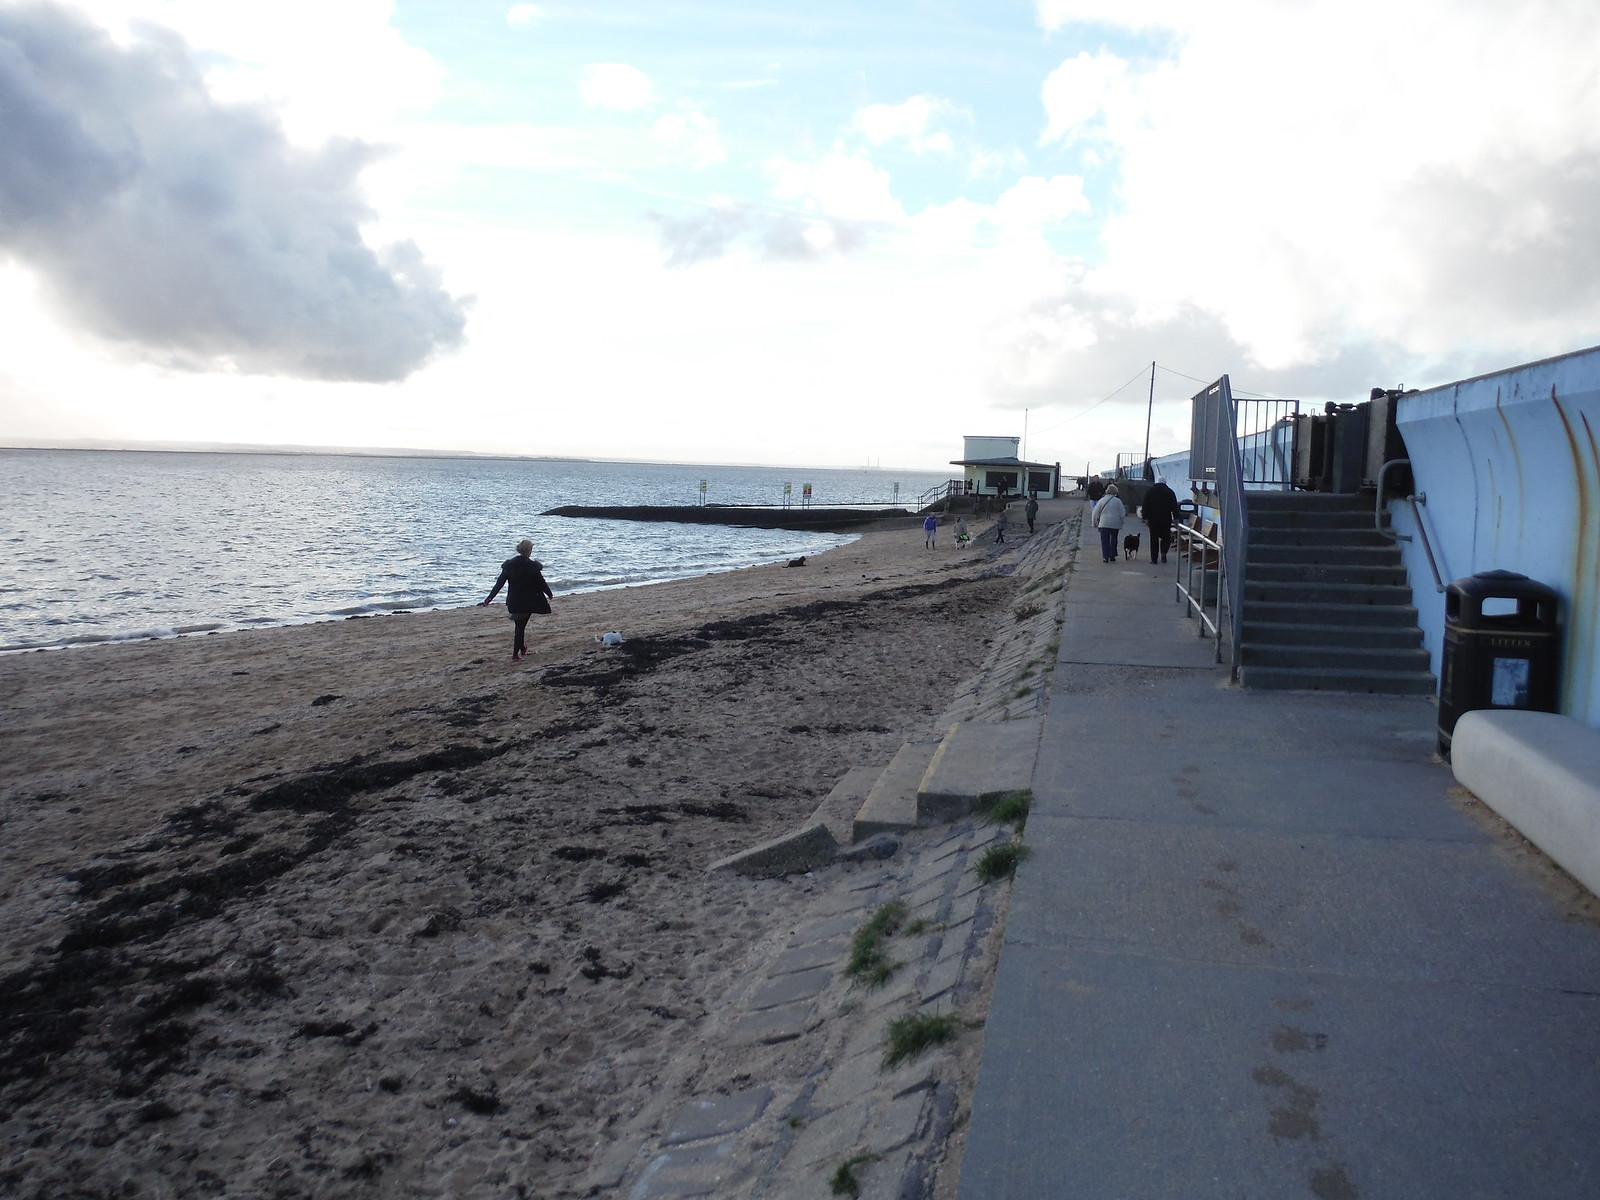 Beaches, Groynes, Paddling Pool, Cafe: Concord Beach, Canvey Island SWC Walk 258 Benfleet Circular (via Canvey Island)